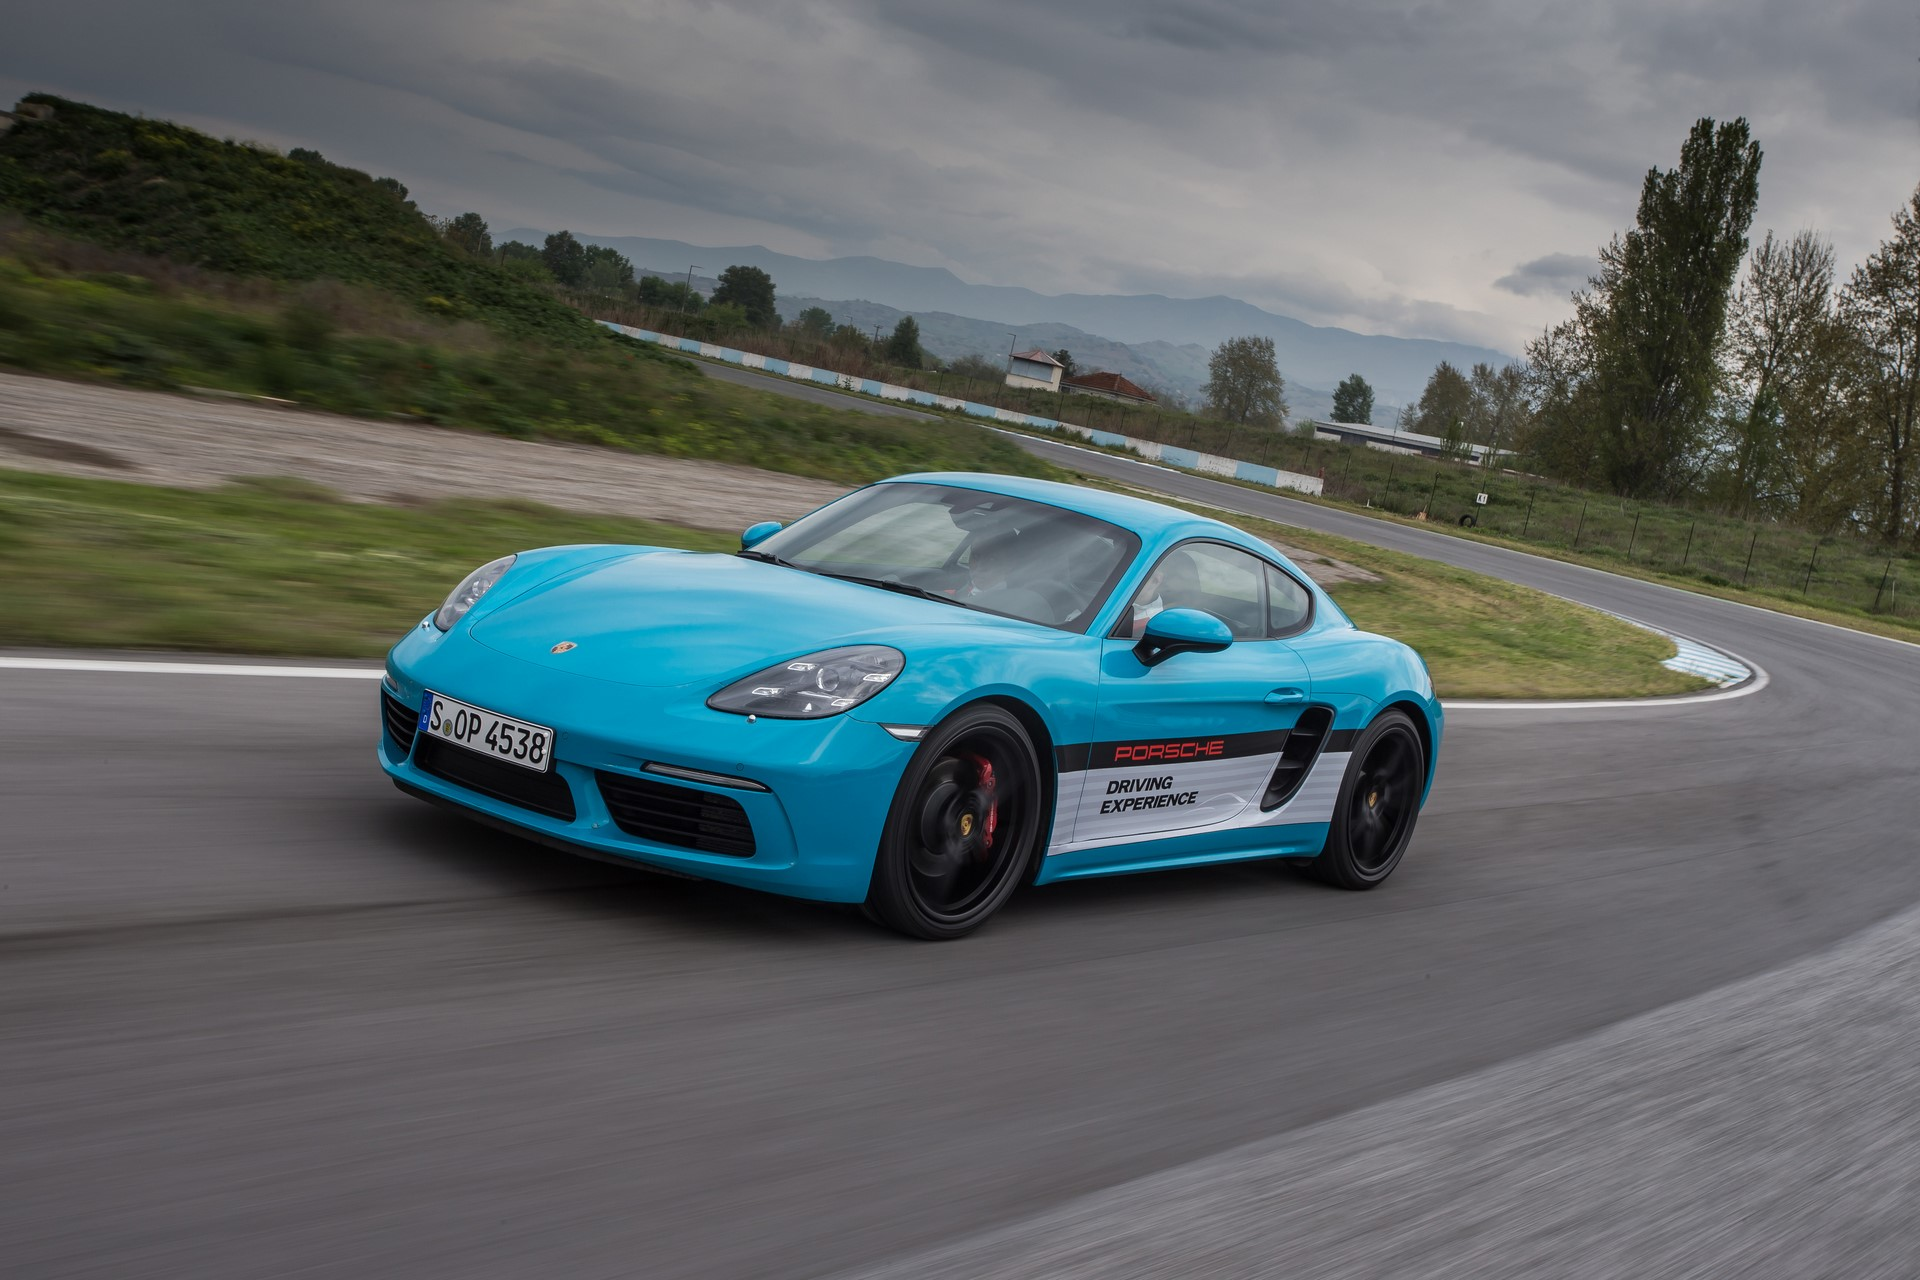 Porsche Driving Experience 2017 Serres (36)